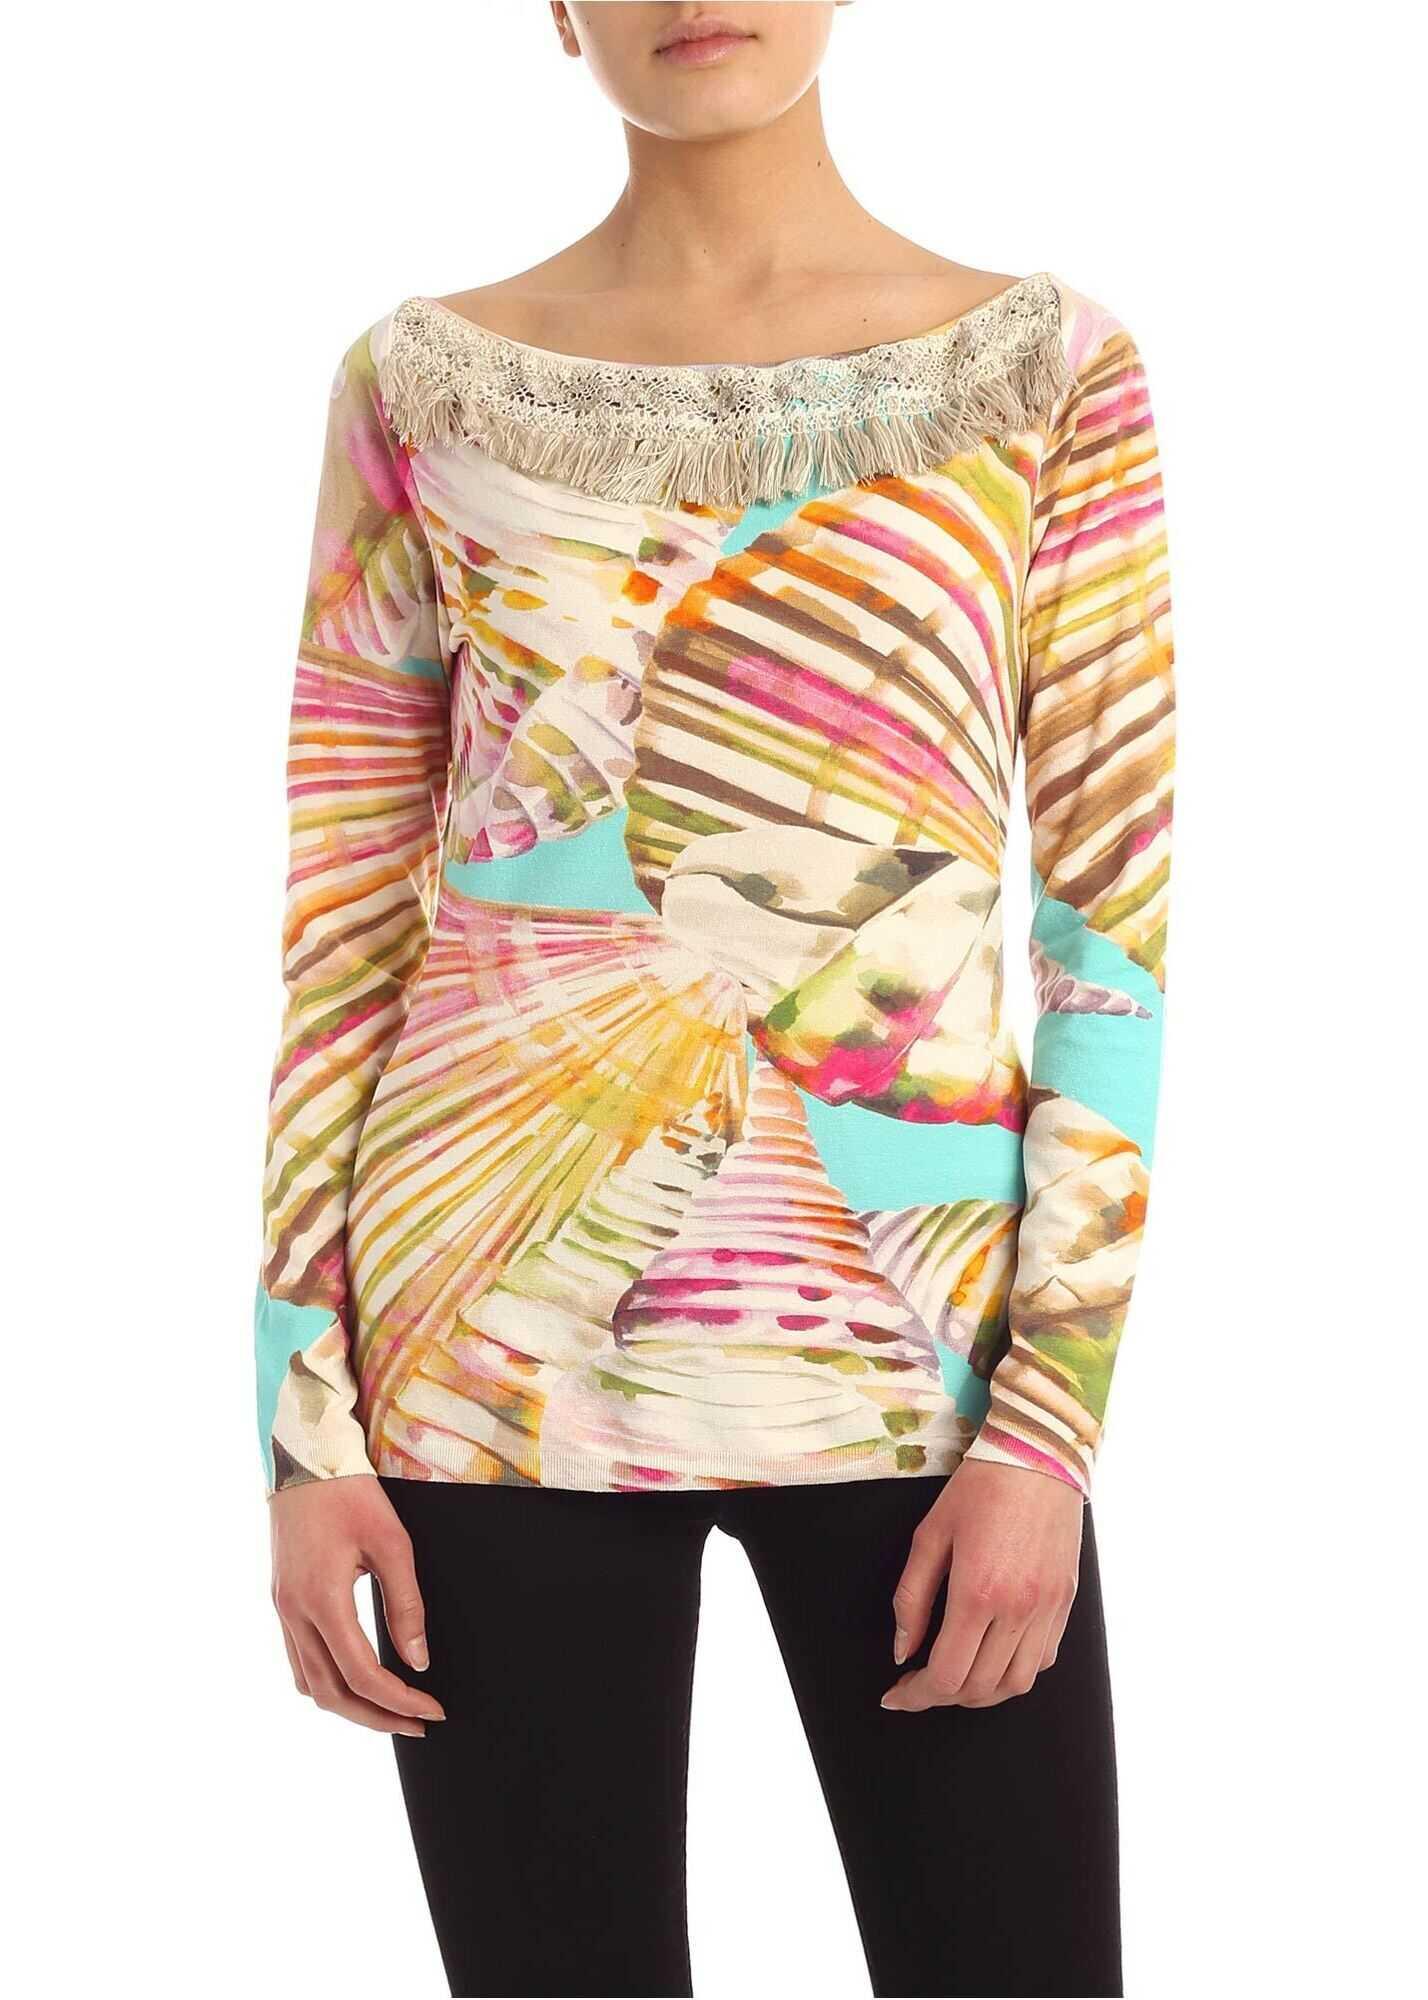 Blumarine Trimmings Multicolor Sweater Multi